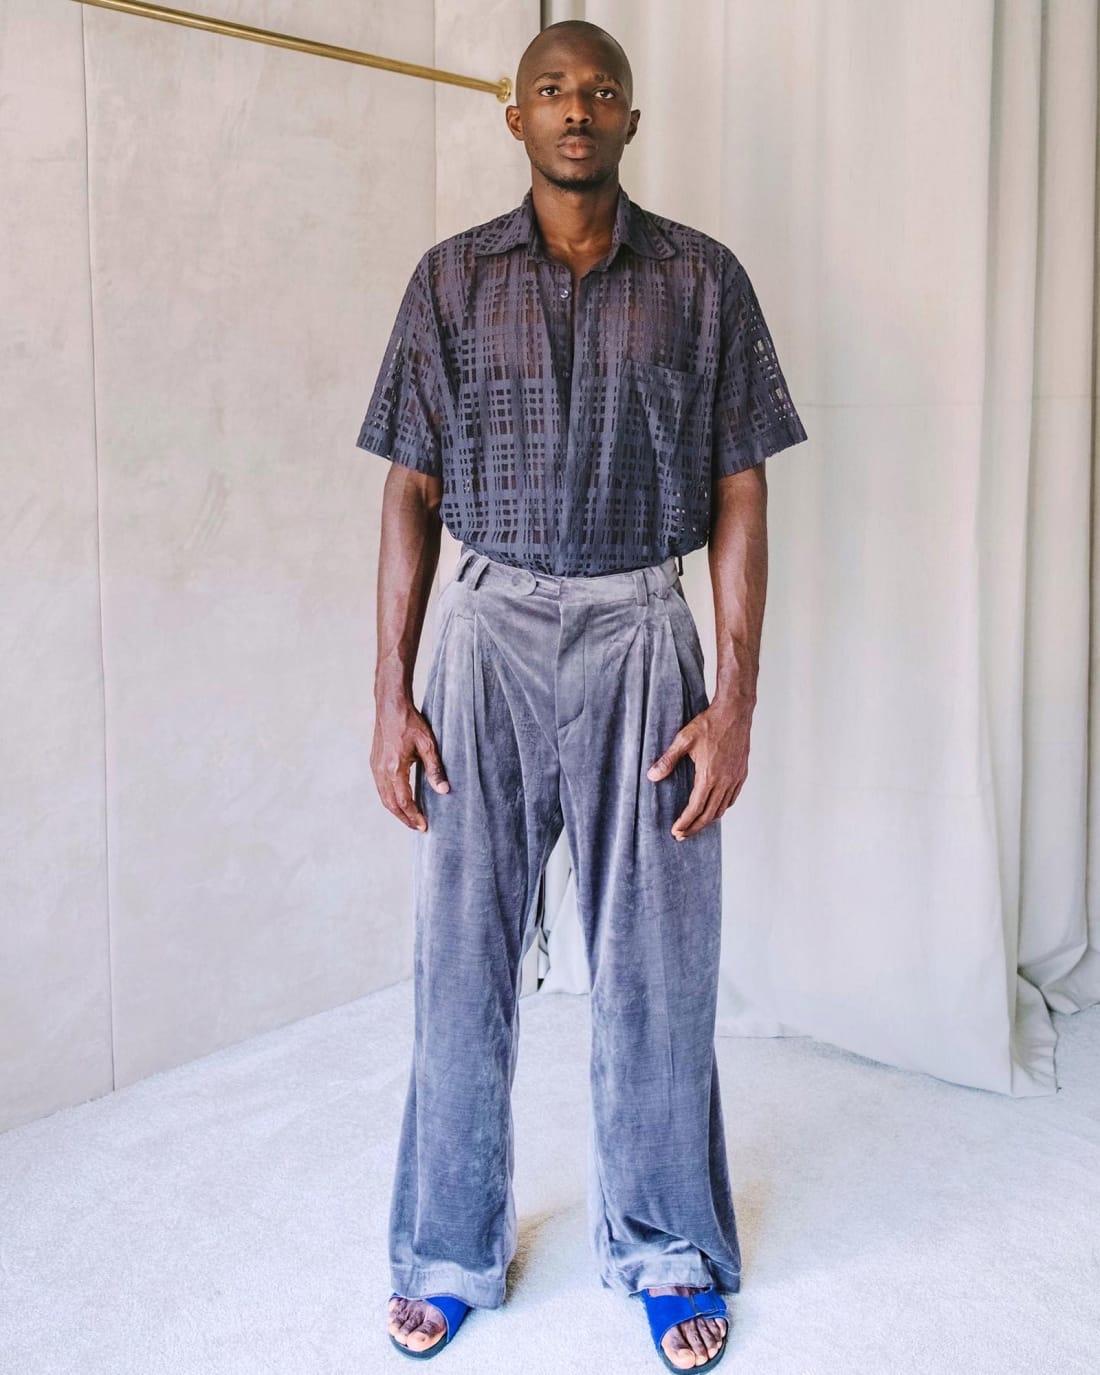 RESTRICTED 02 naomi campbell ian audifferen nigeria fashion hnk spc intl